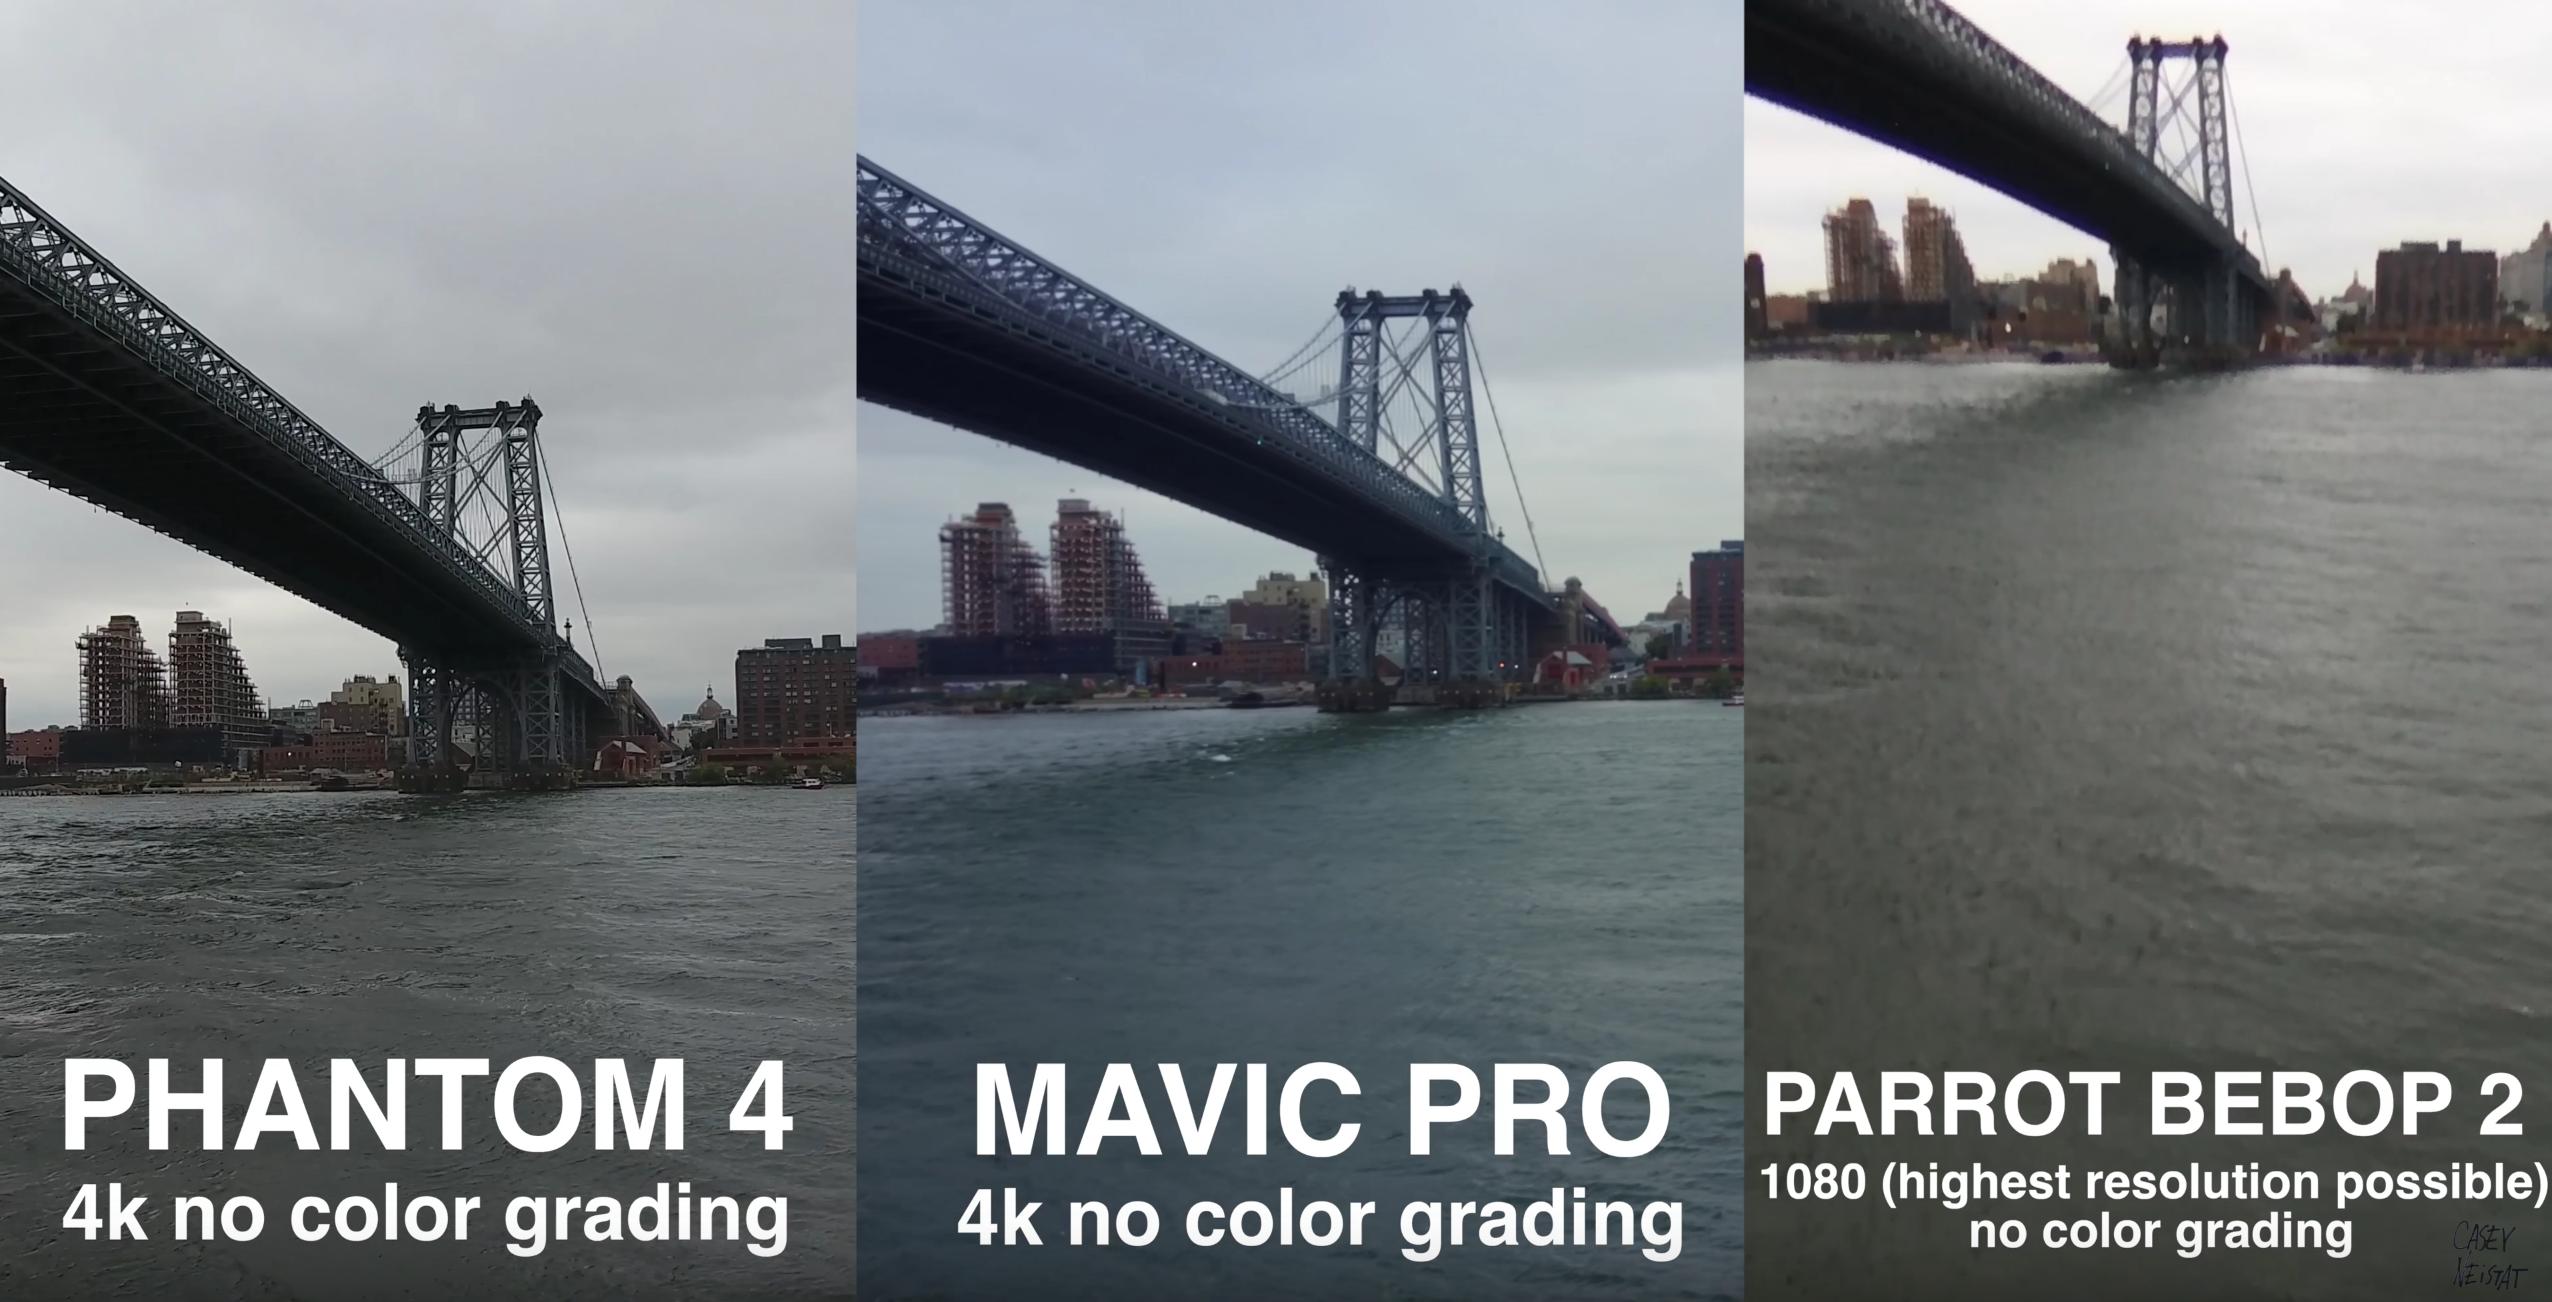 Comparing The DJI Phantom 4 To New Mavic Pretty Darn Close